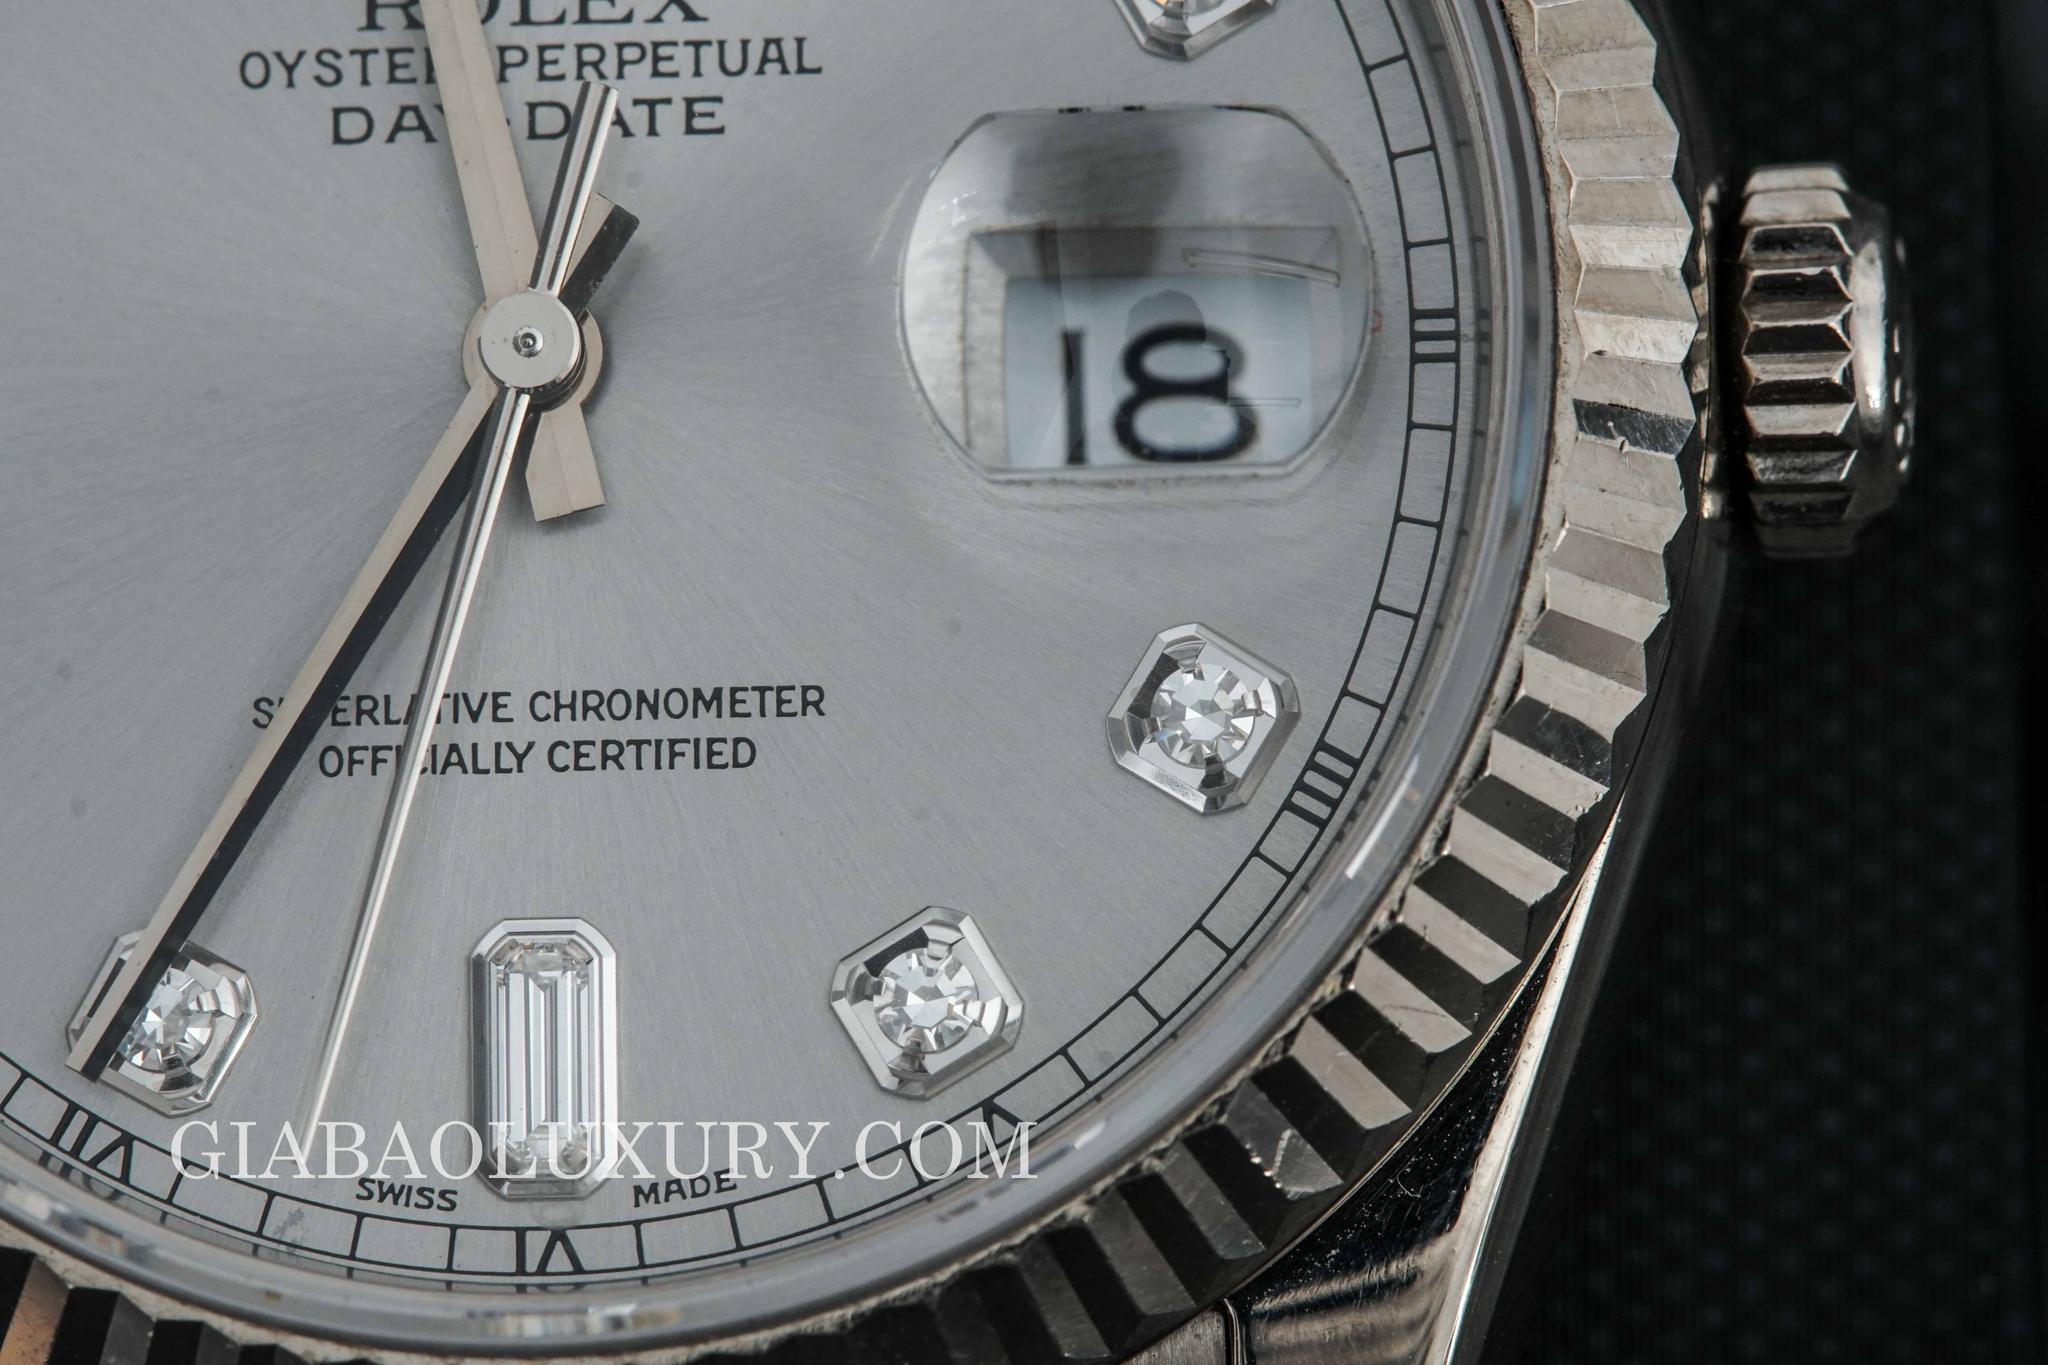 đồng hồ rolex day date 118209